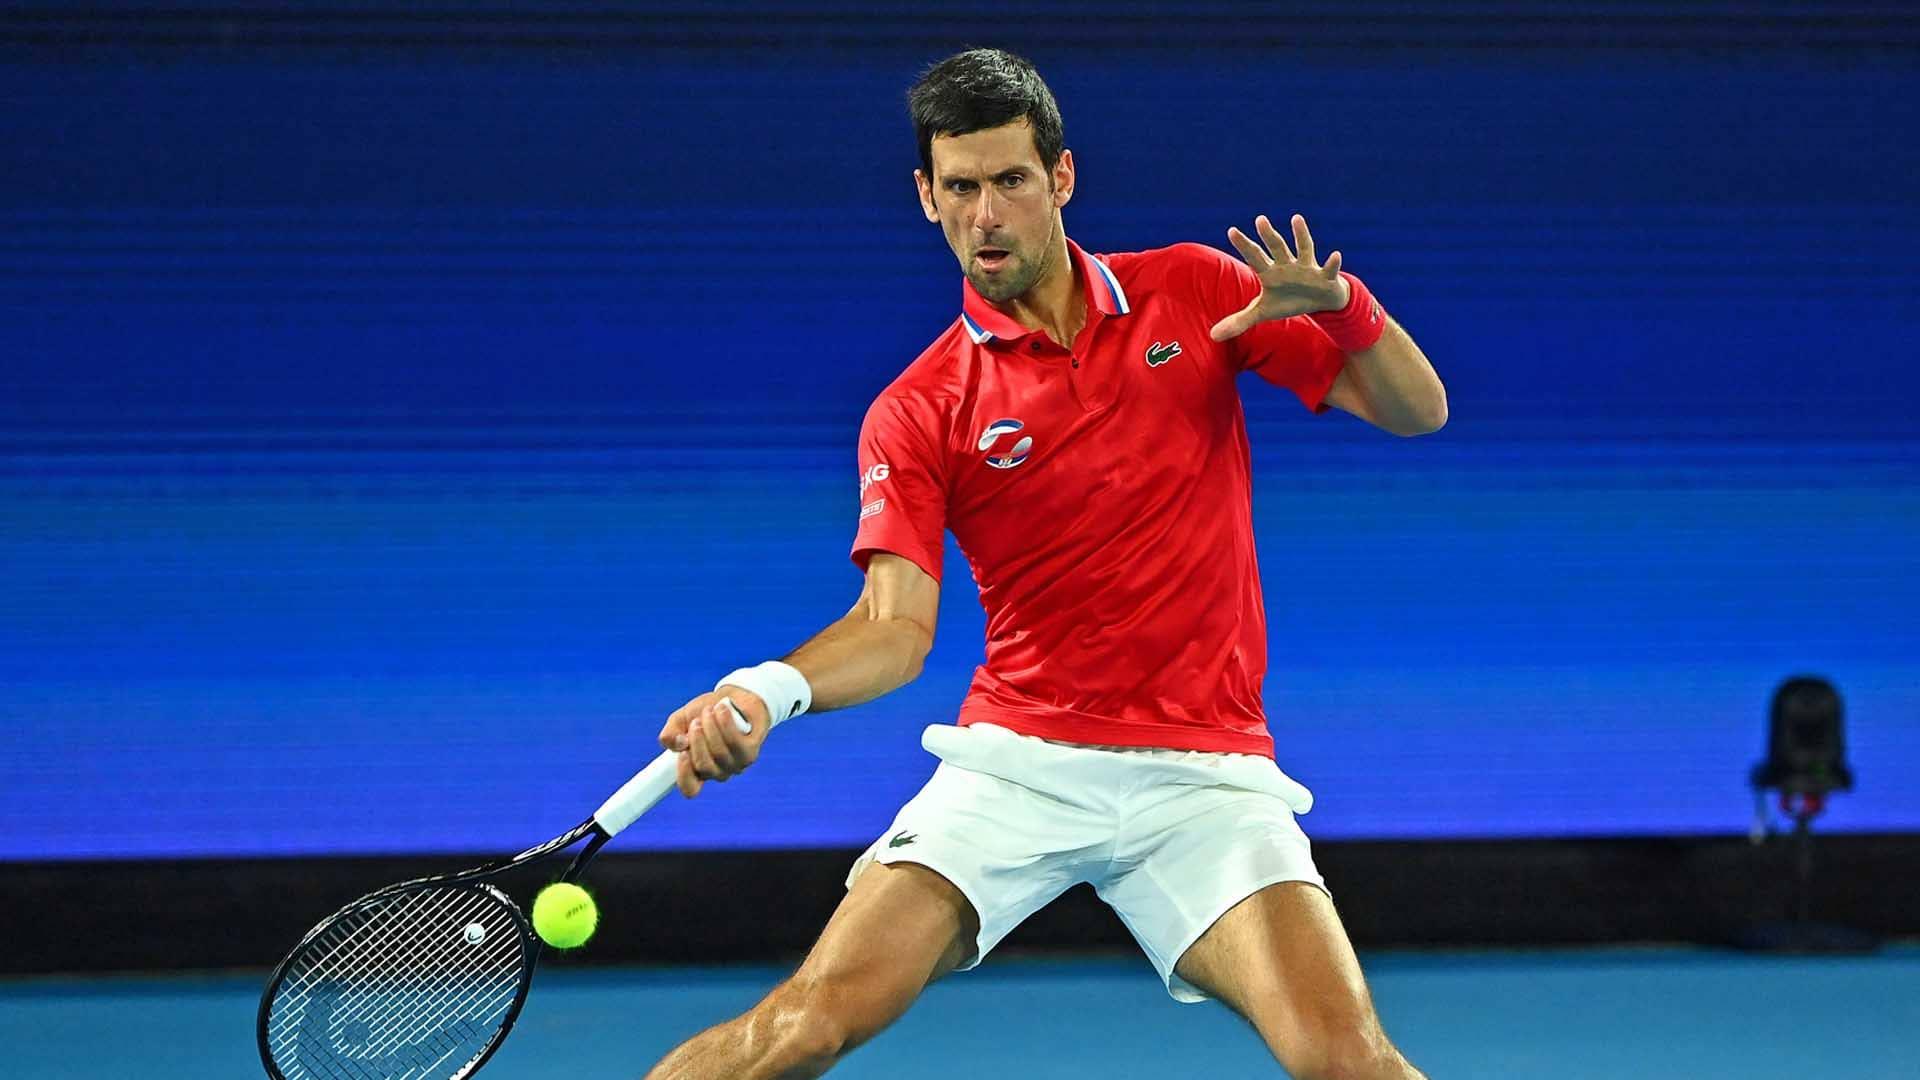 Djokovic terus memenangi pertandingan tunggal tetapi rekan-rekan setimnya kekurangan tenaga dan diambil alih oleh Jerman di Grup A. Foto: ATP.